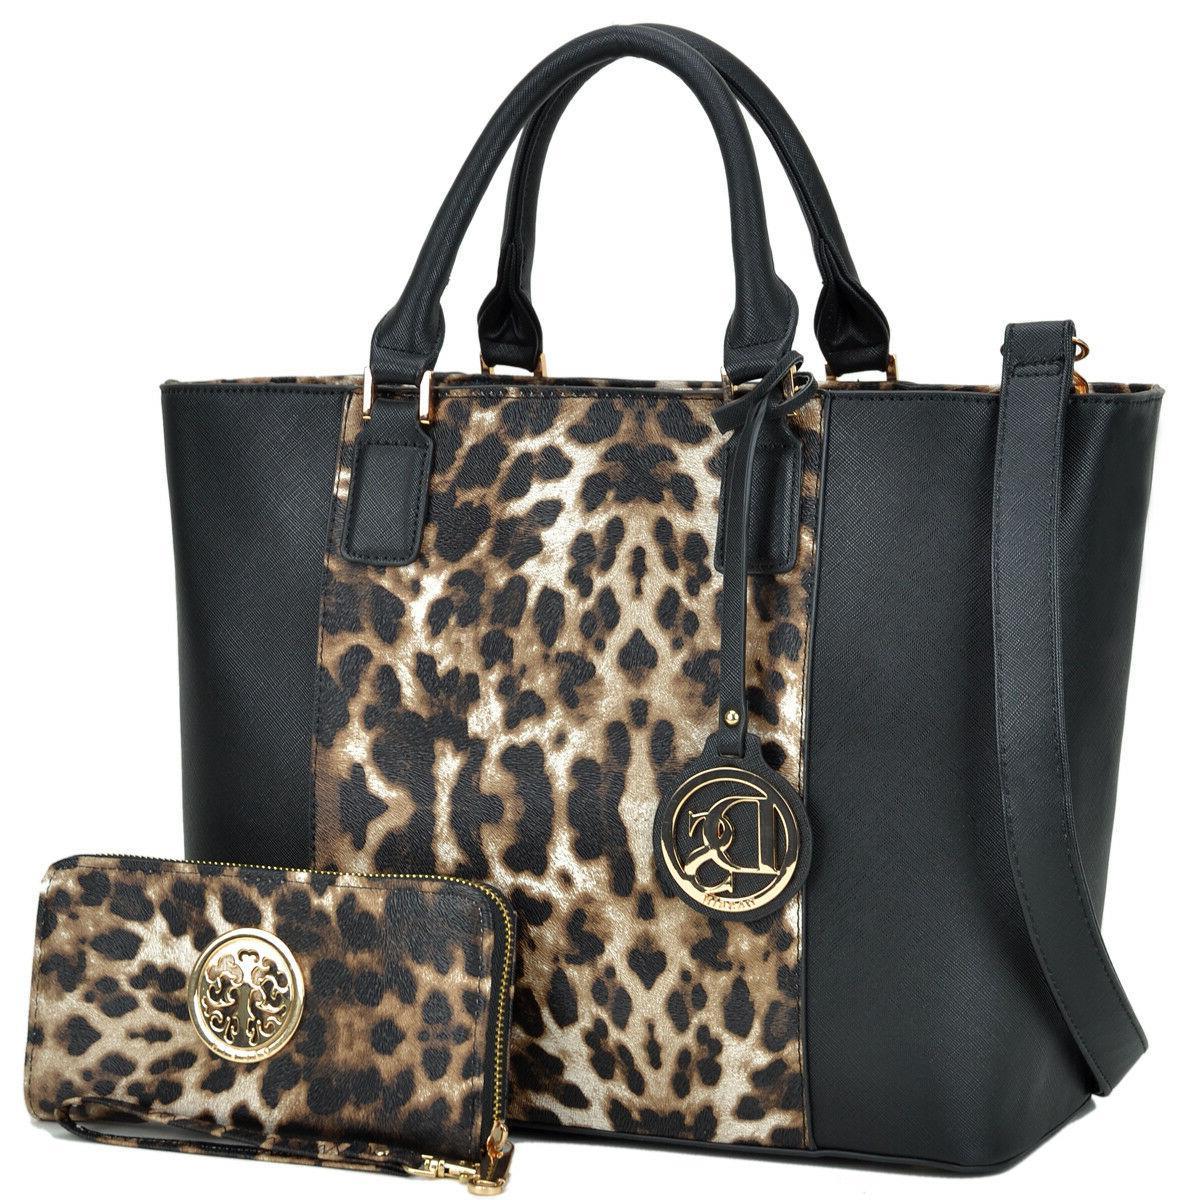 Dasein Women Faux Leather Handbag Shoulder Bag Tote Purse Sa